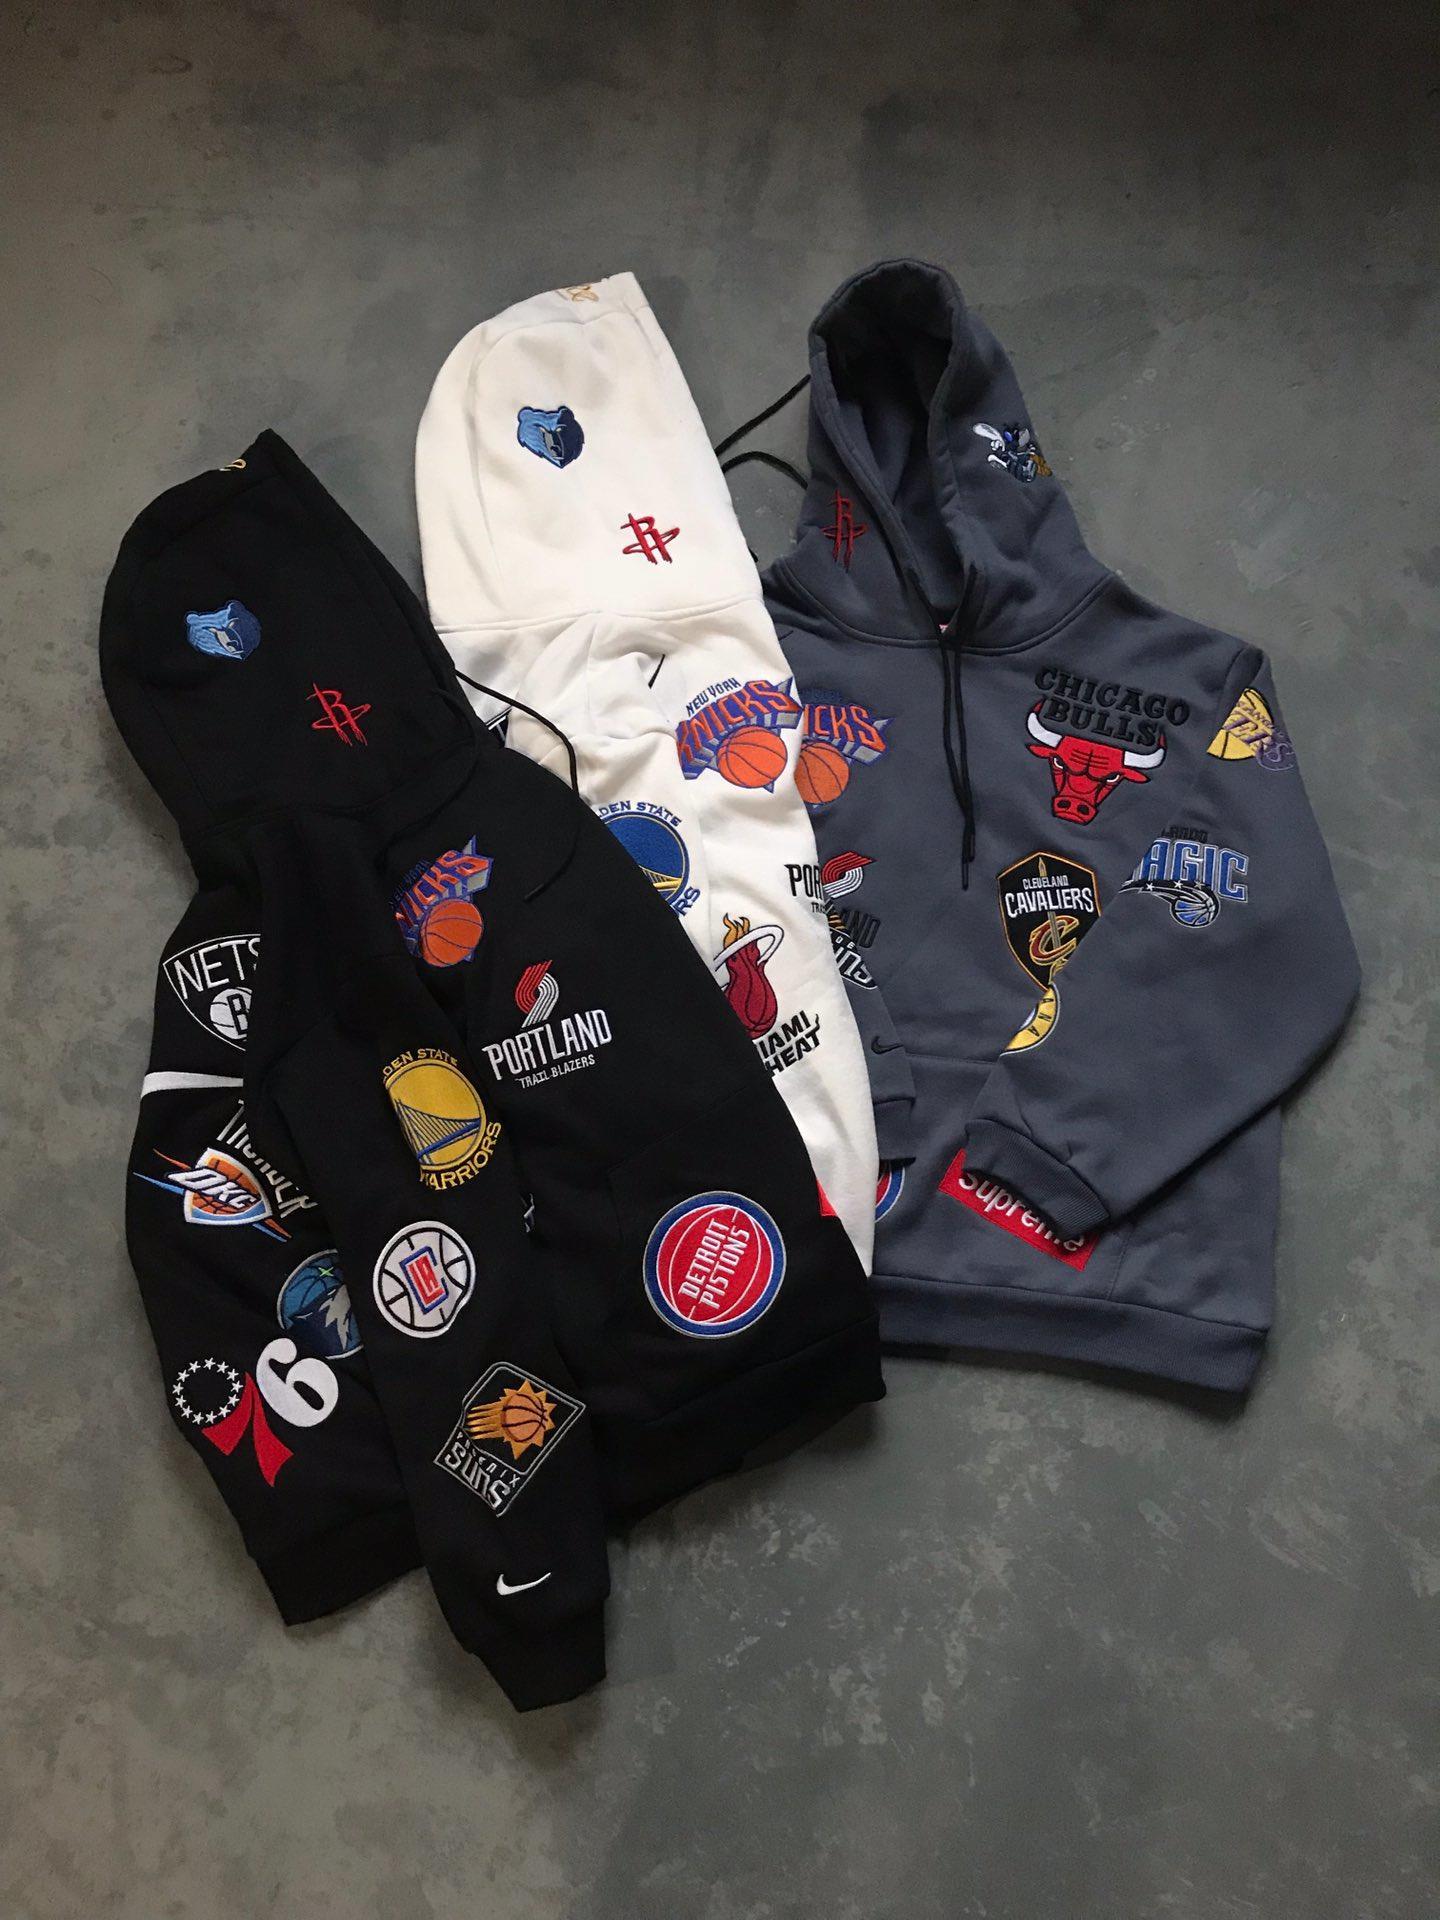 Supreme シュプリーム*NIKE*NBA  カップル スウェット 国内販売店 通販大丈夫 最新入荷